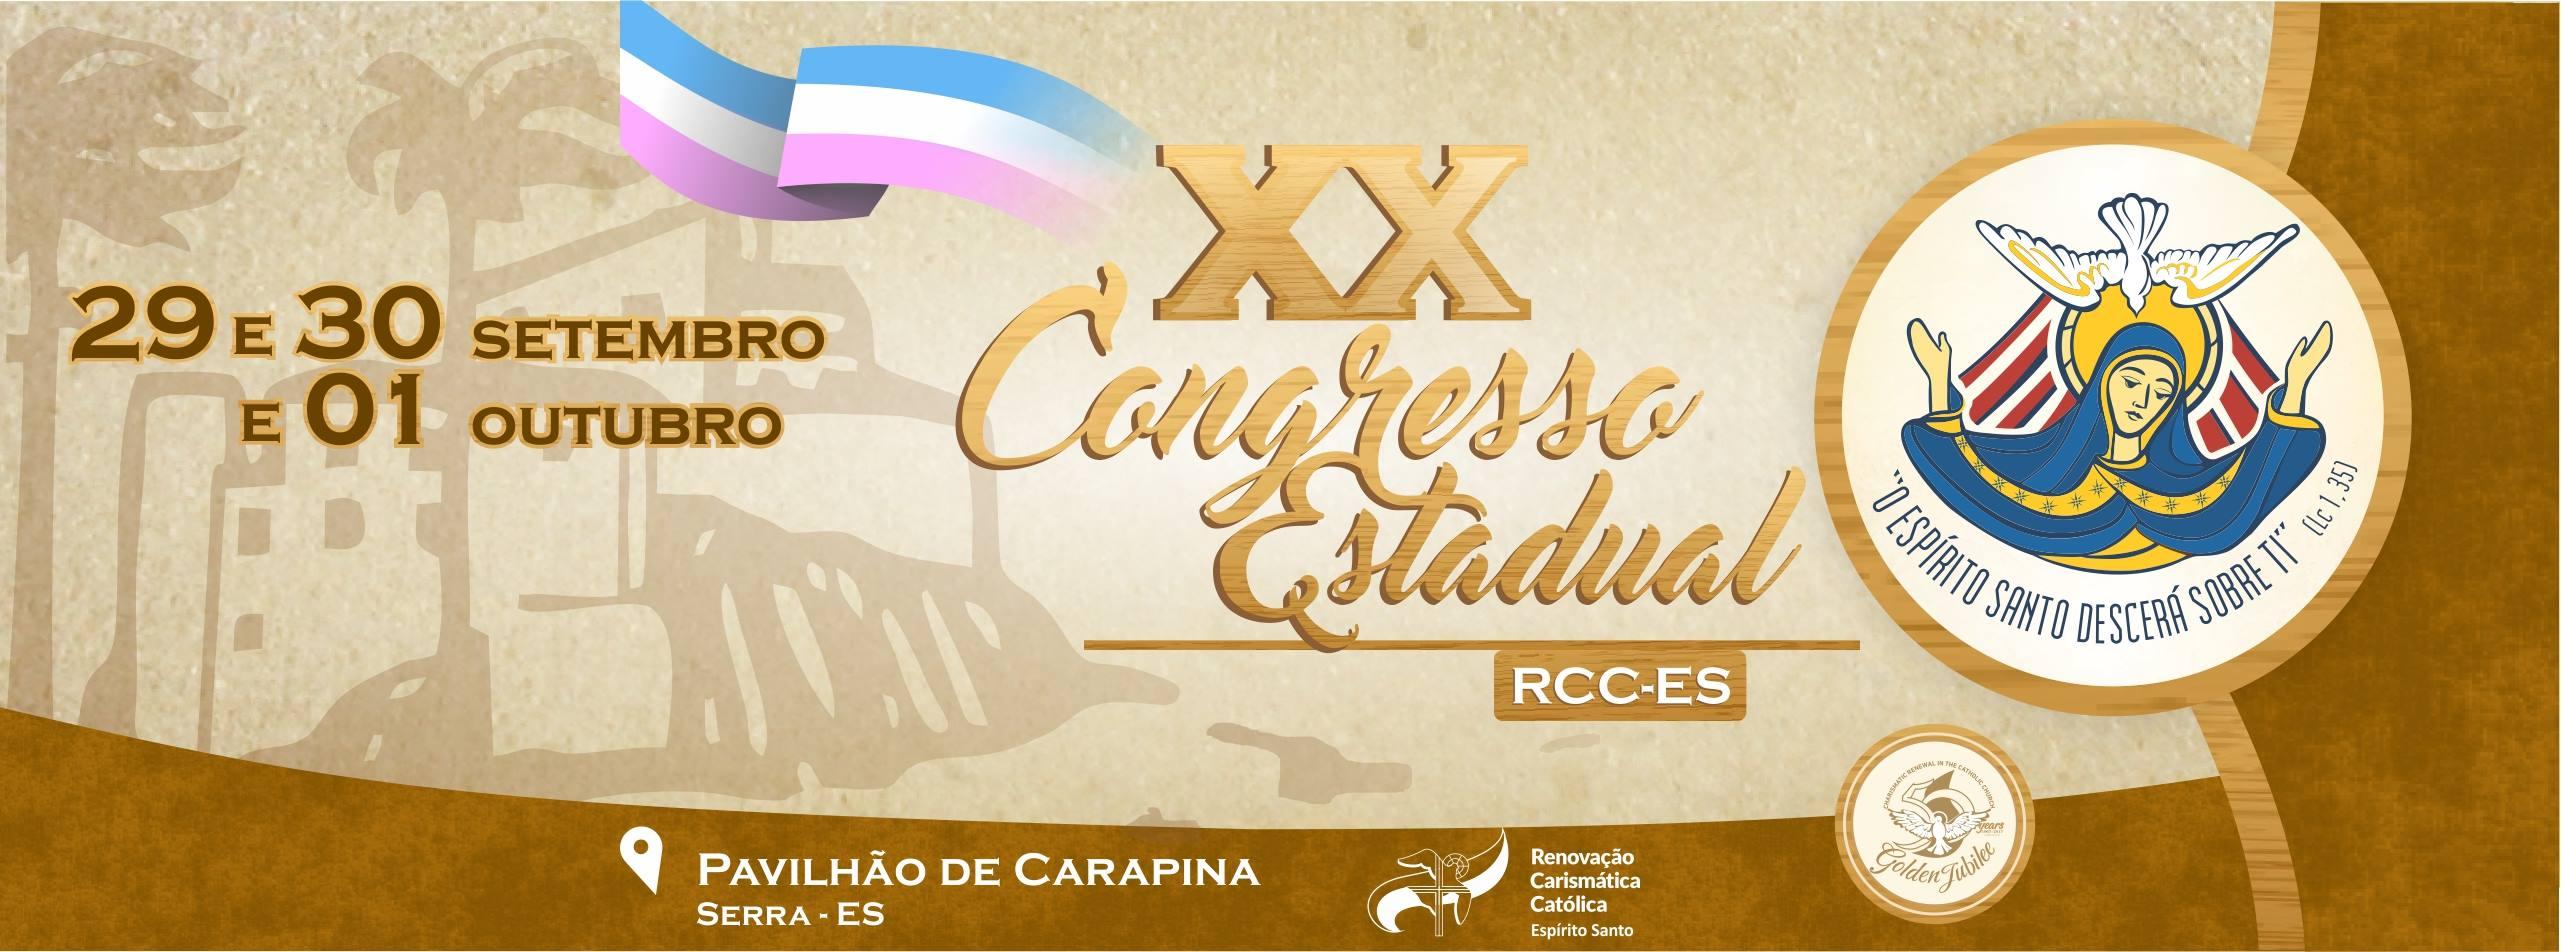 XX Congresso Estadual RCC-ES